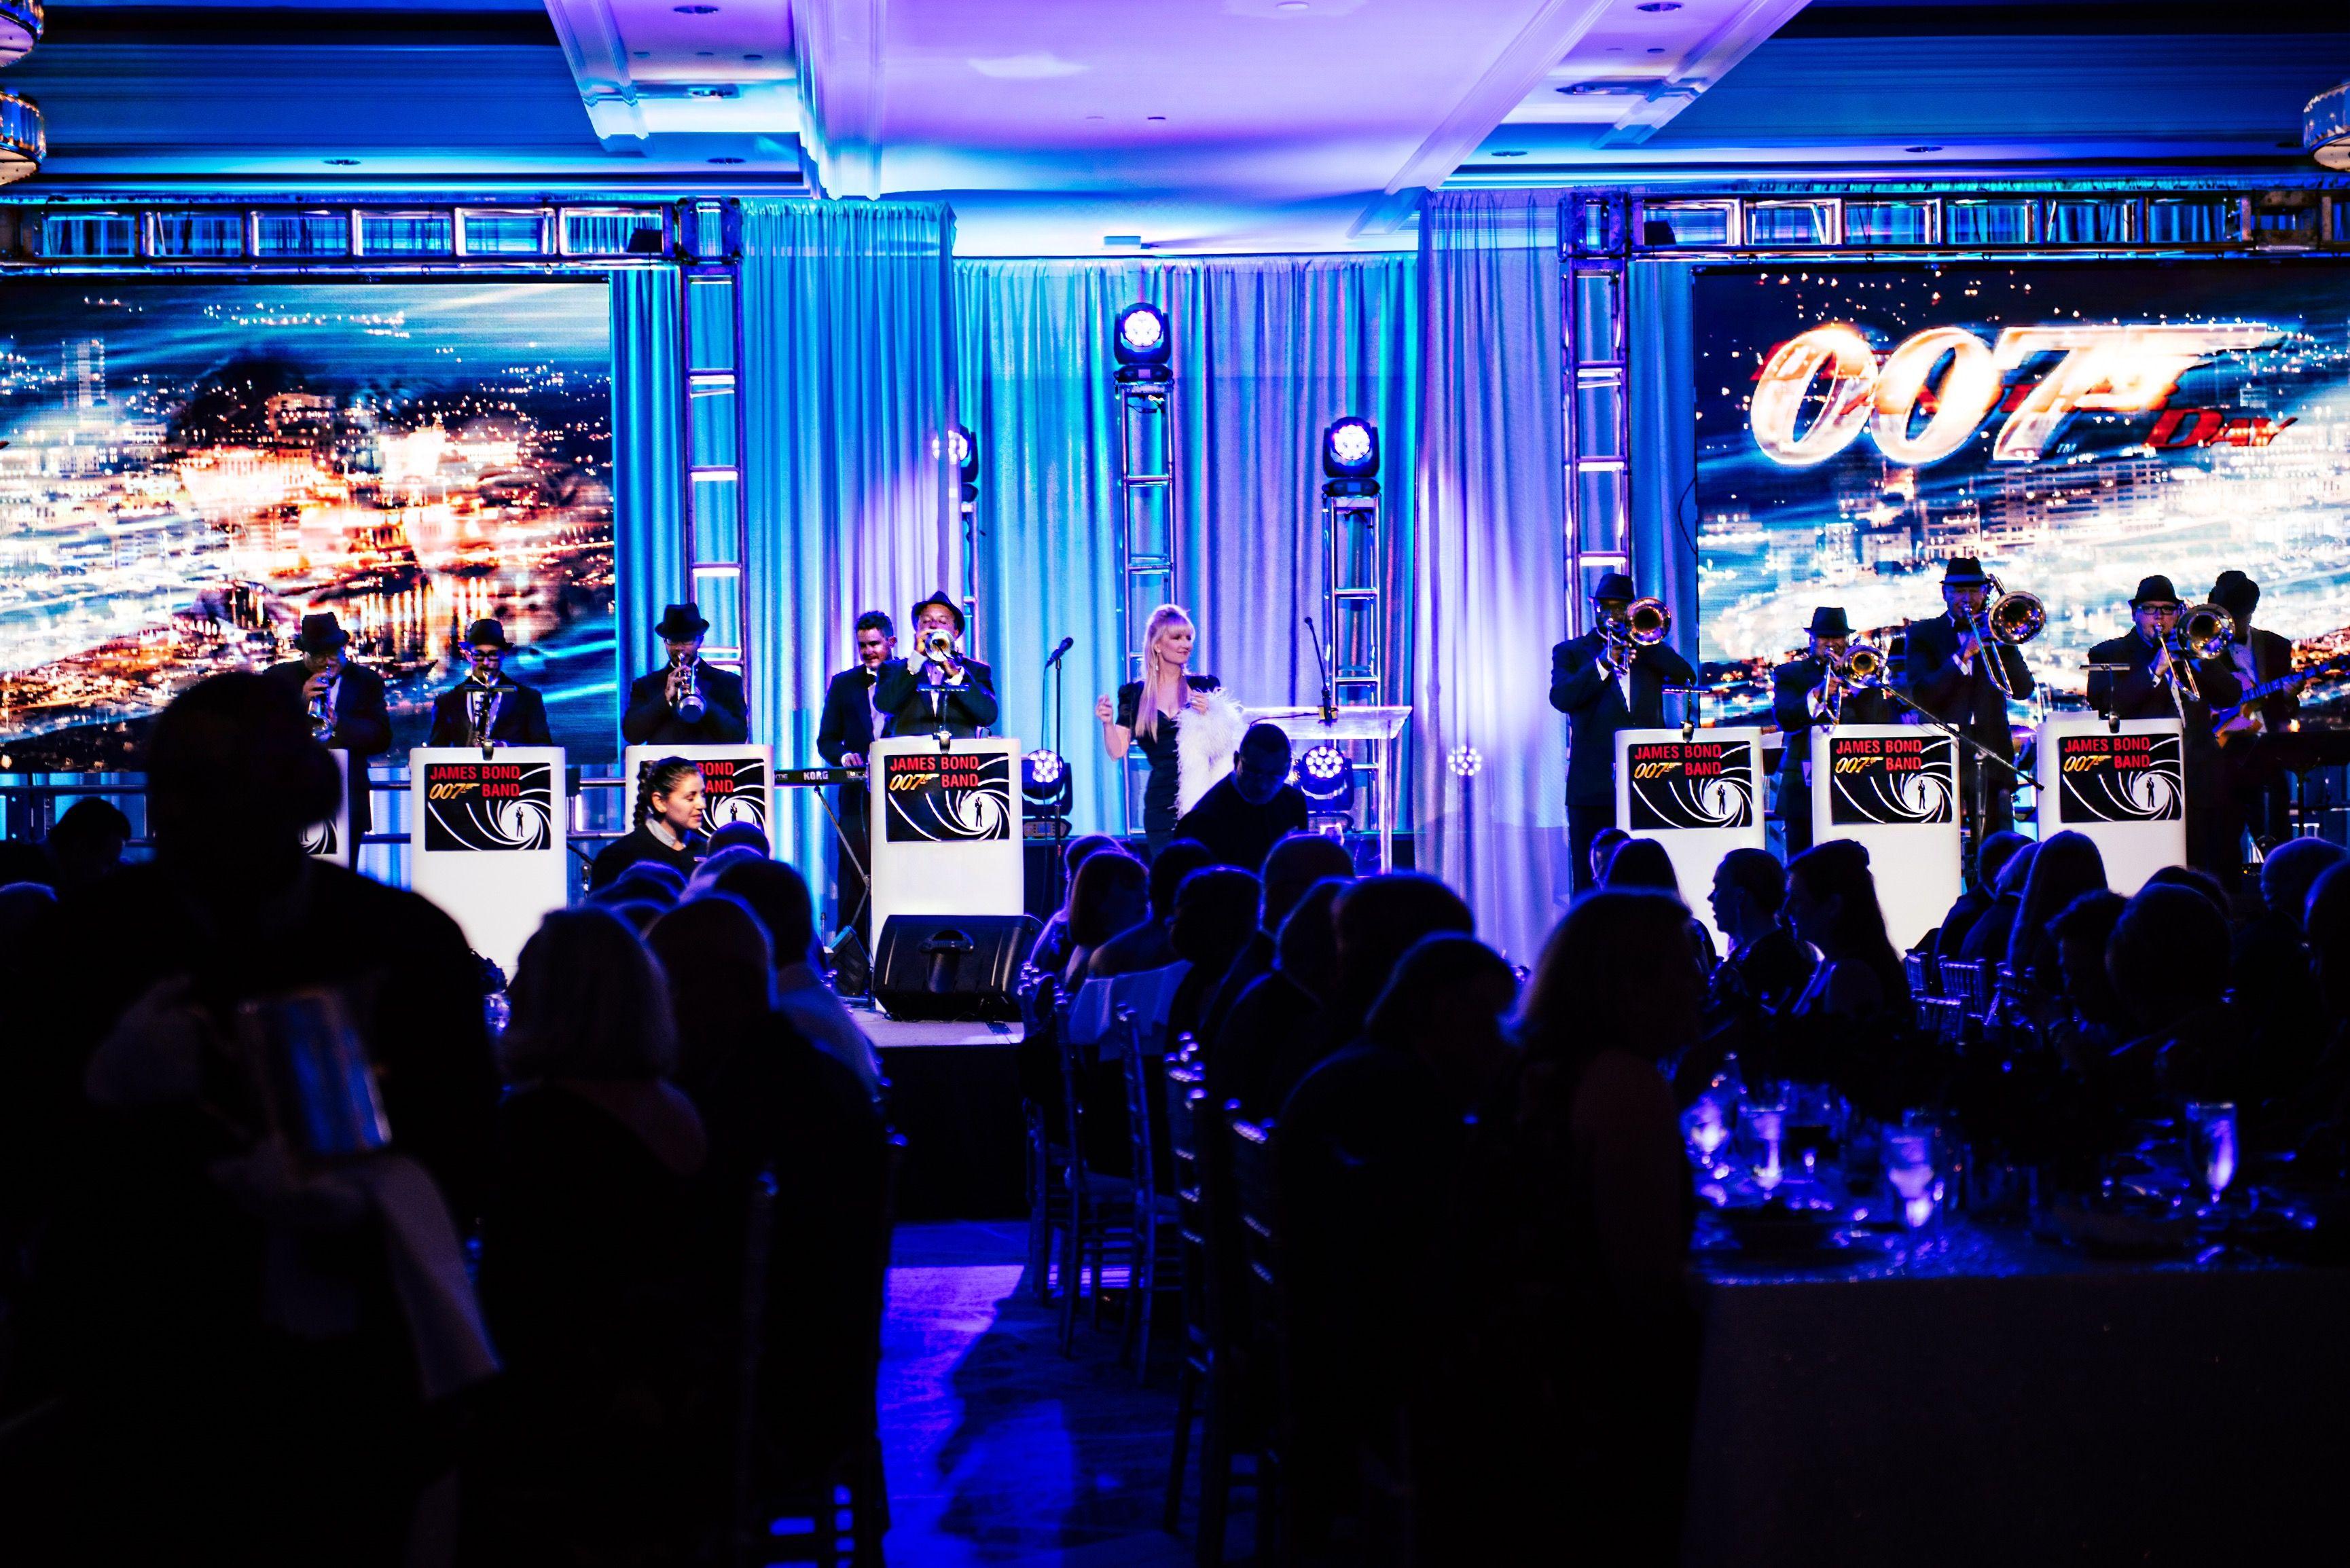 James Bond Band, the 007 Bond Band from Orlando, Florida